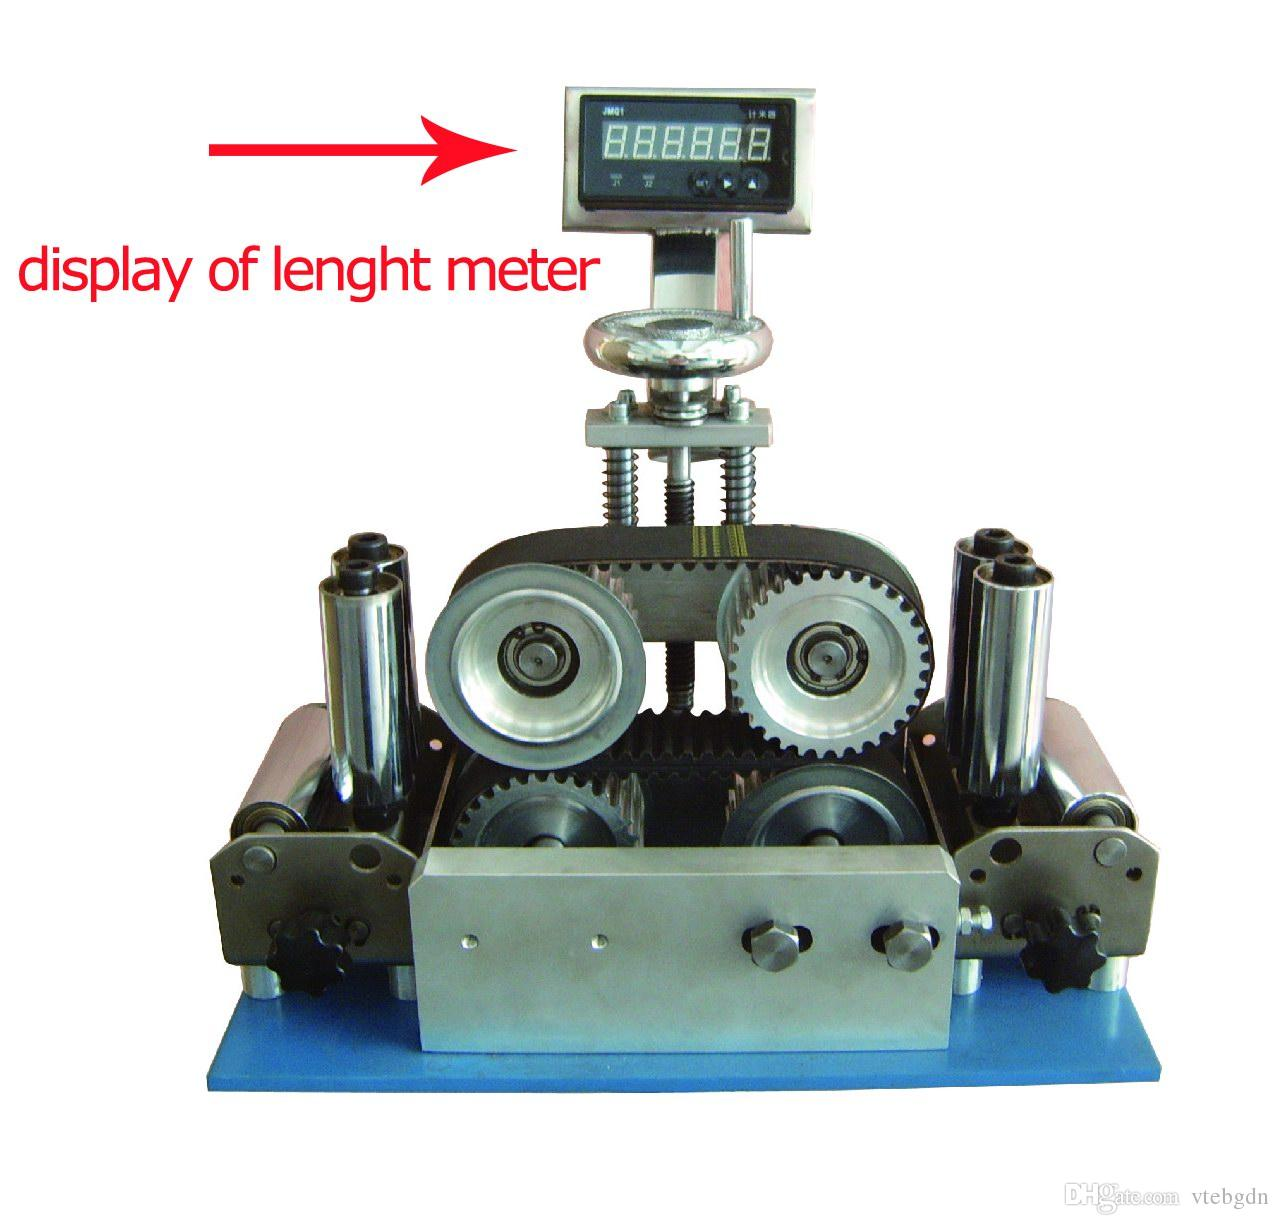 Cable Length Measuring Equipment : Compre medidor de contador digital dígitos